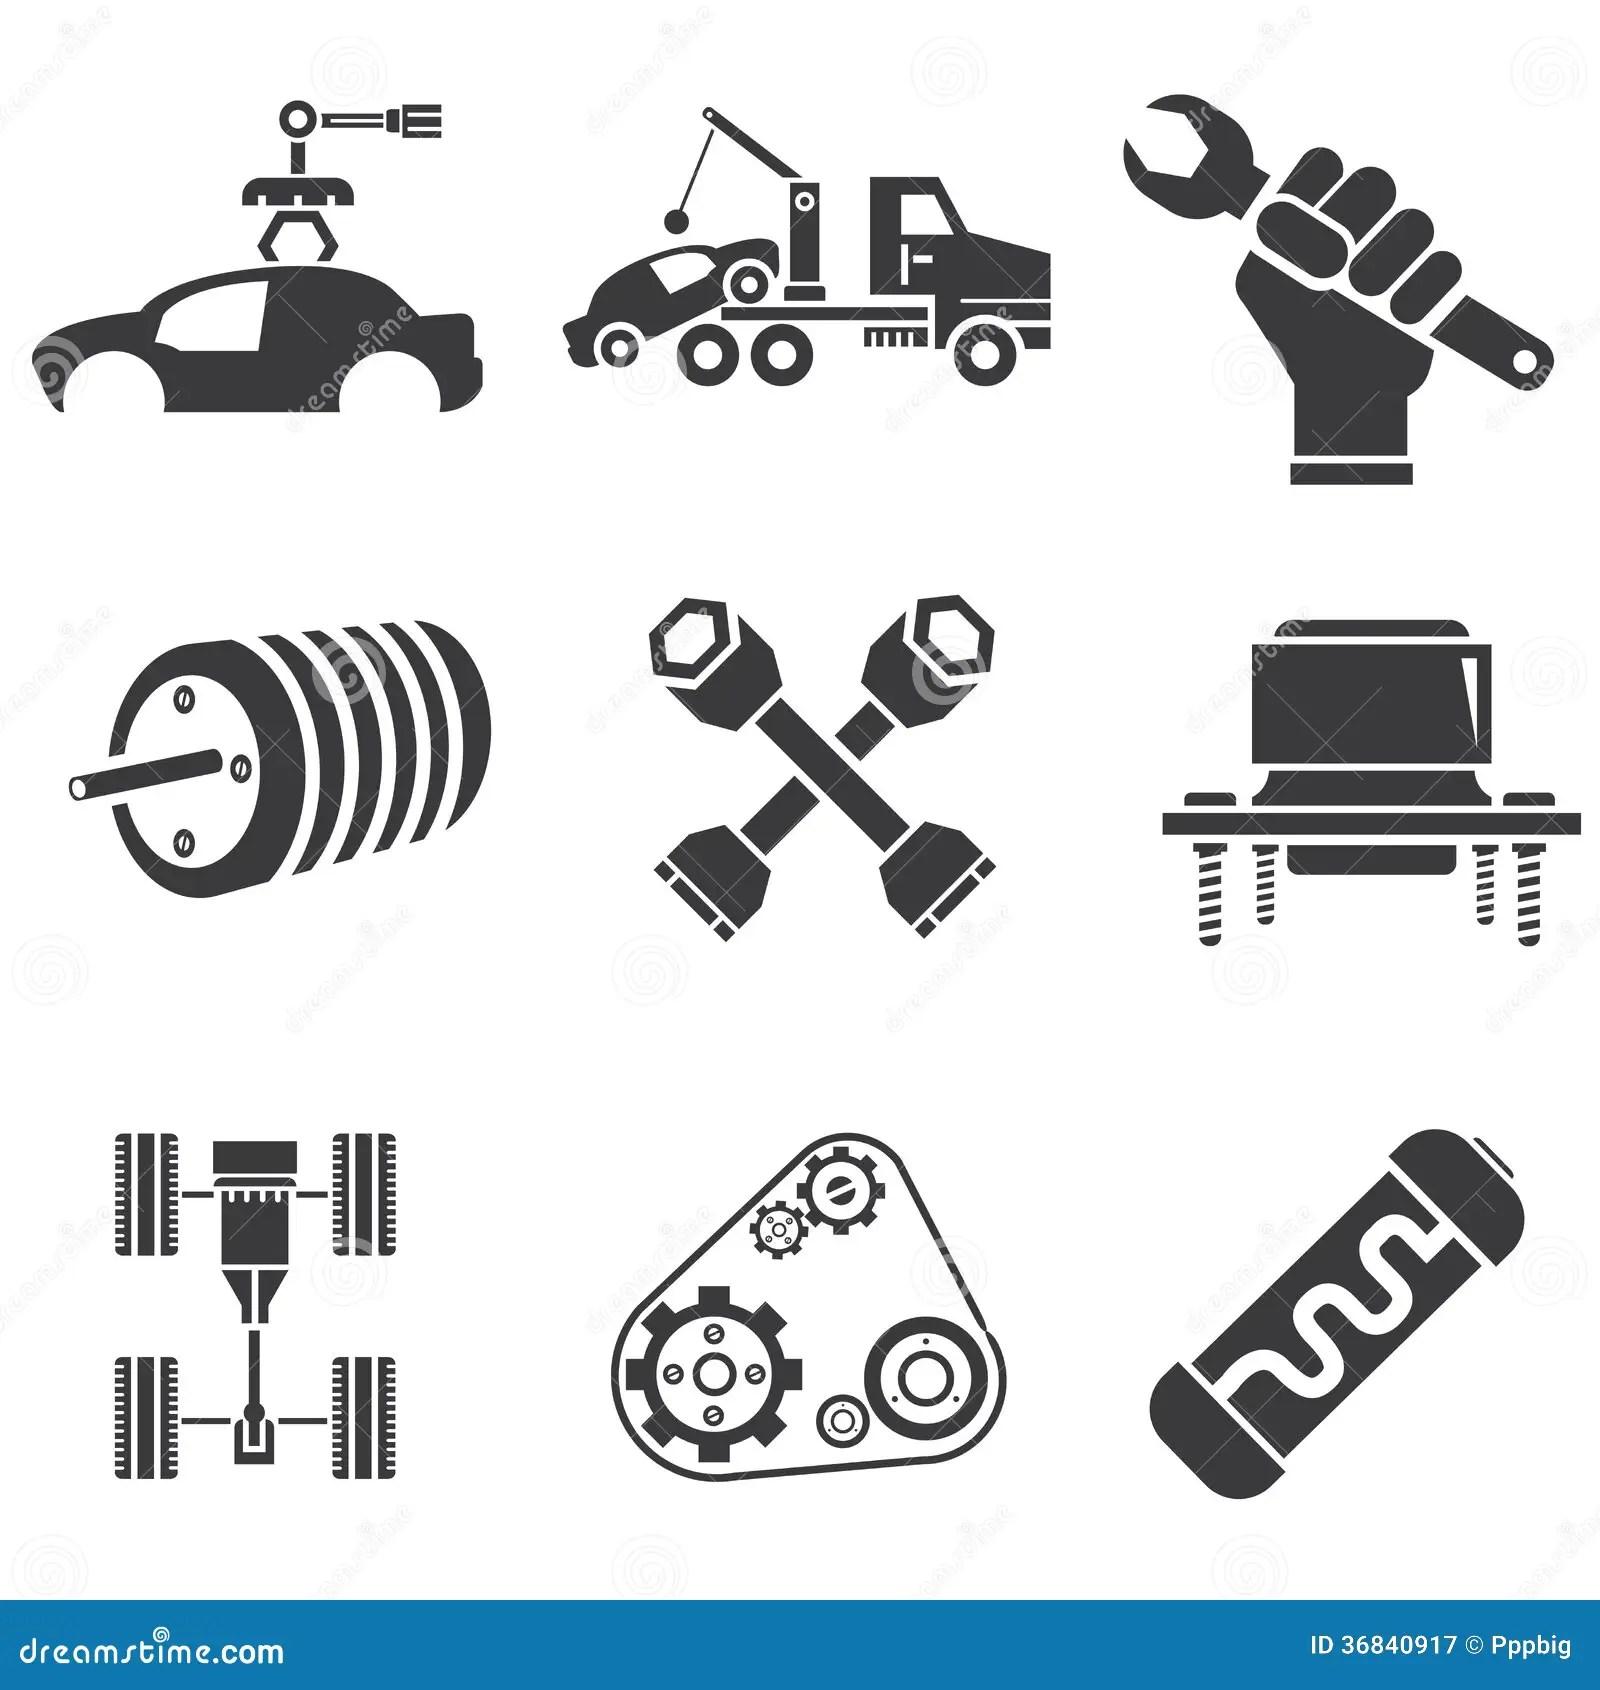 Automotive icons stock illustration. Illustration of